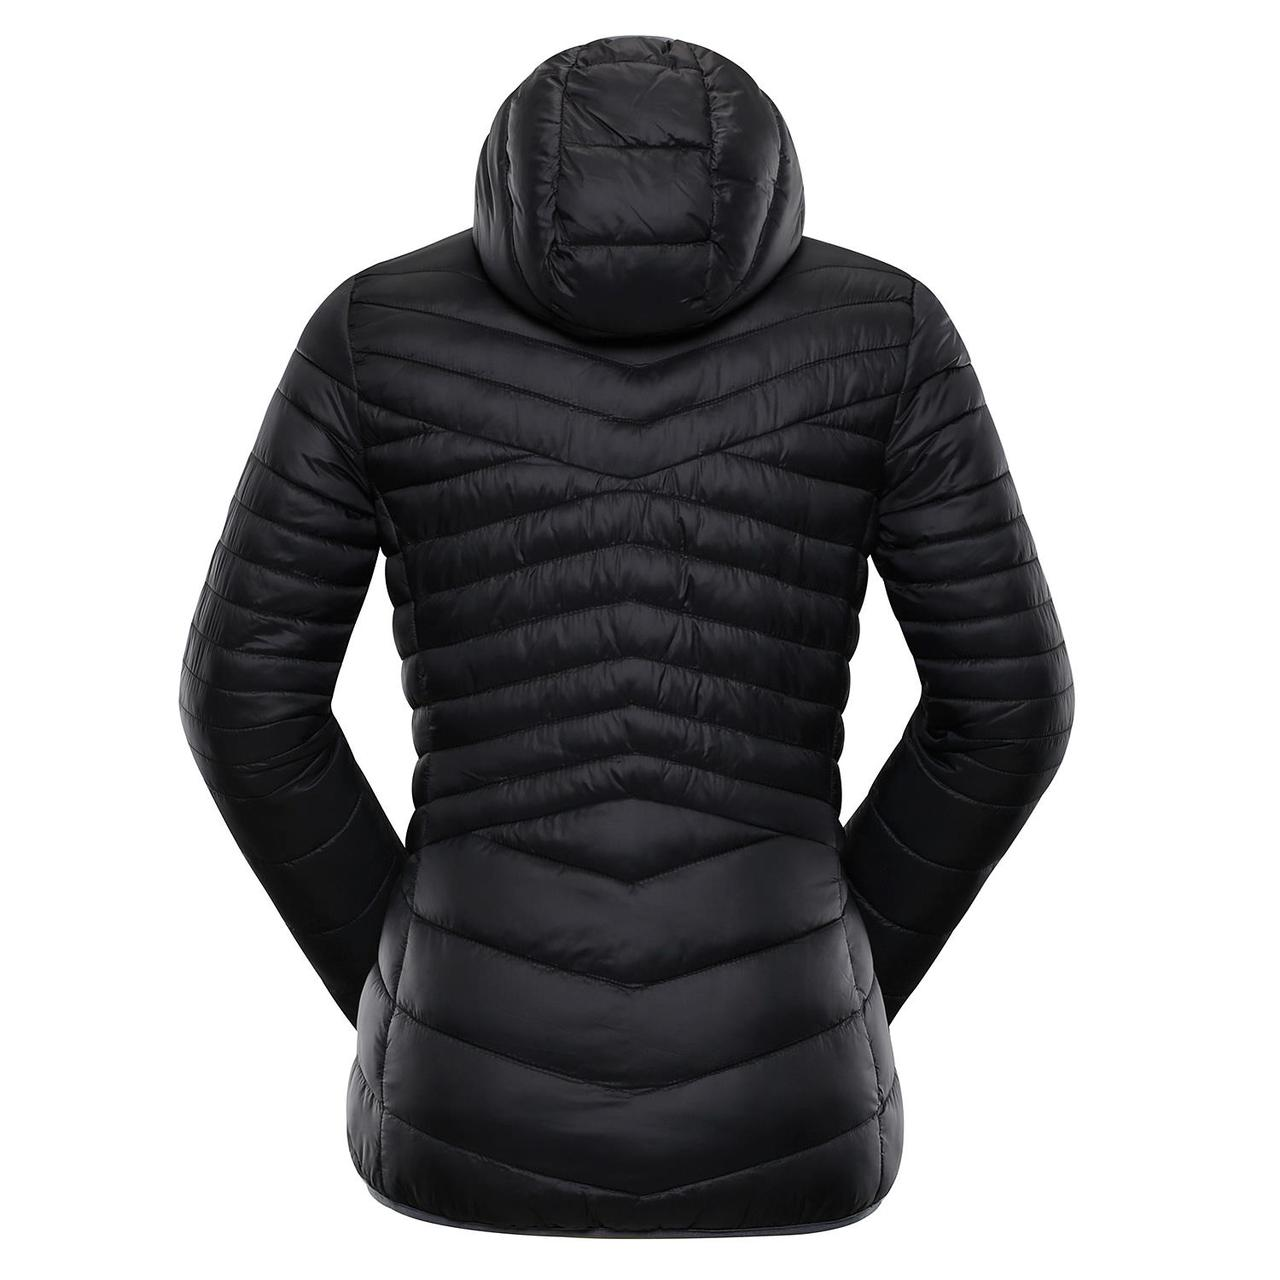 Куртка MUNSRA 5 - фото 2